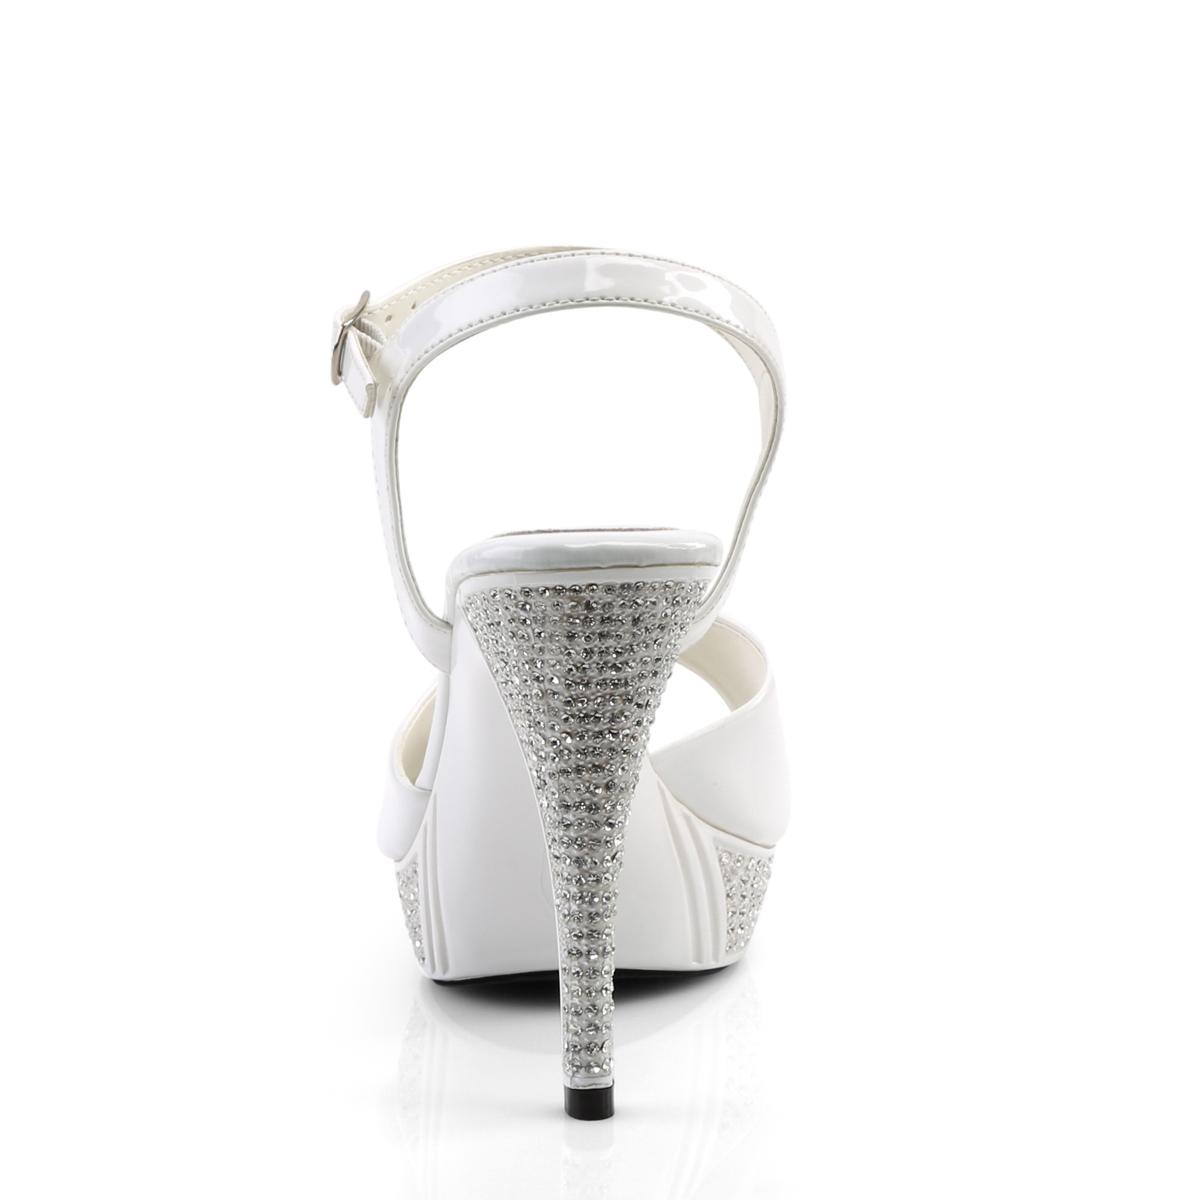 Man/Woman Jil Sander Black Patent Leather Heels Fine workmanship stable stable workmanship quality Modern mode d99648